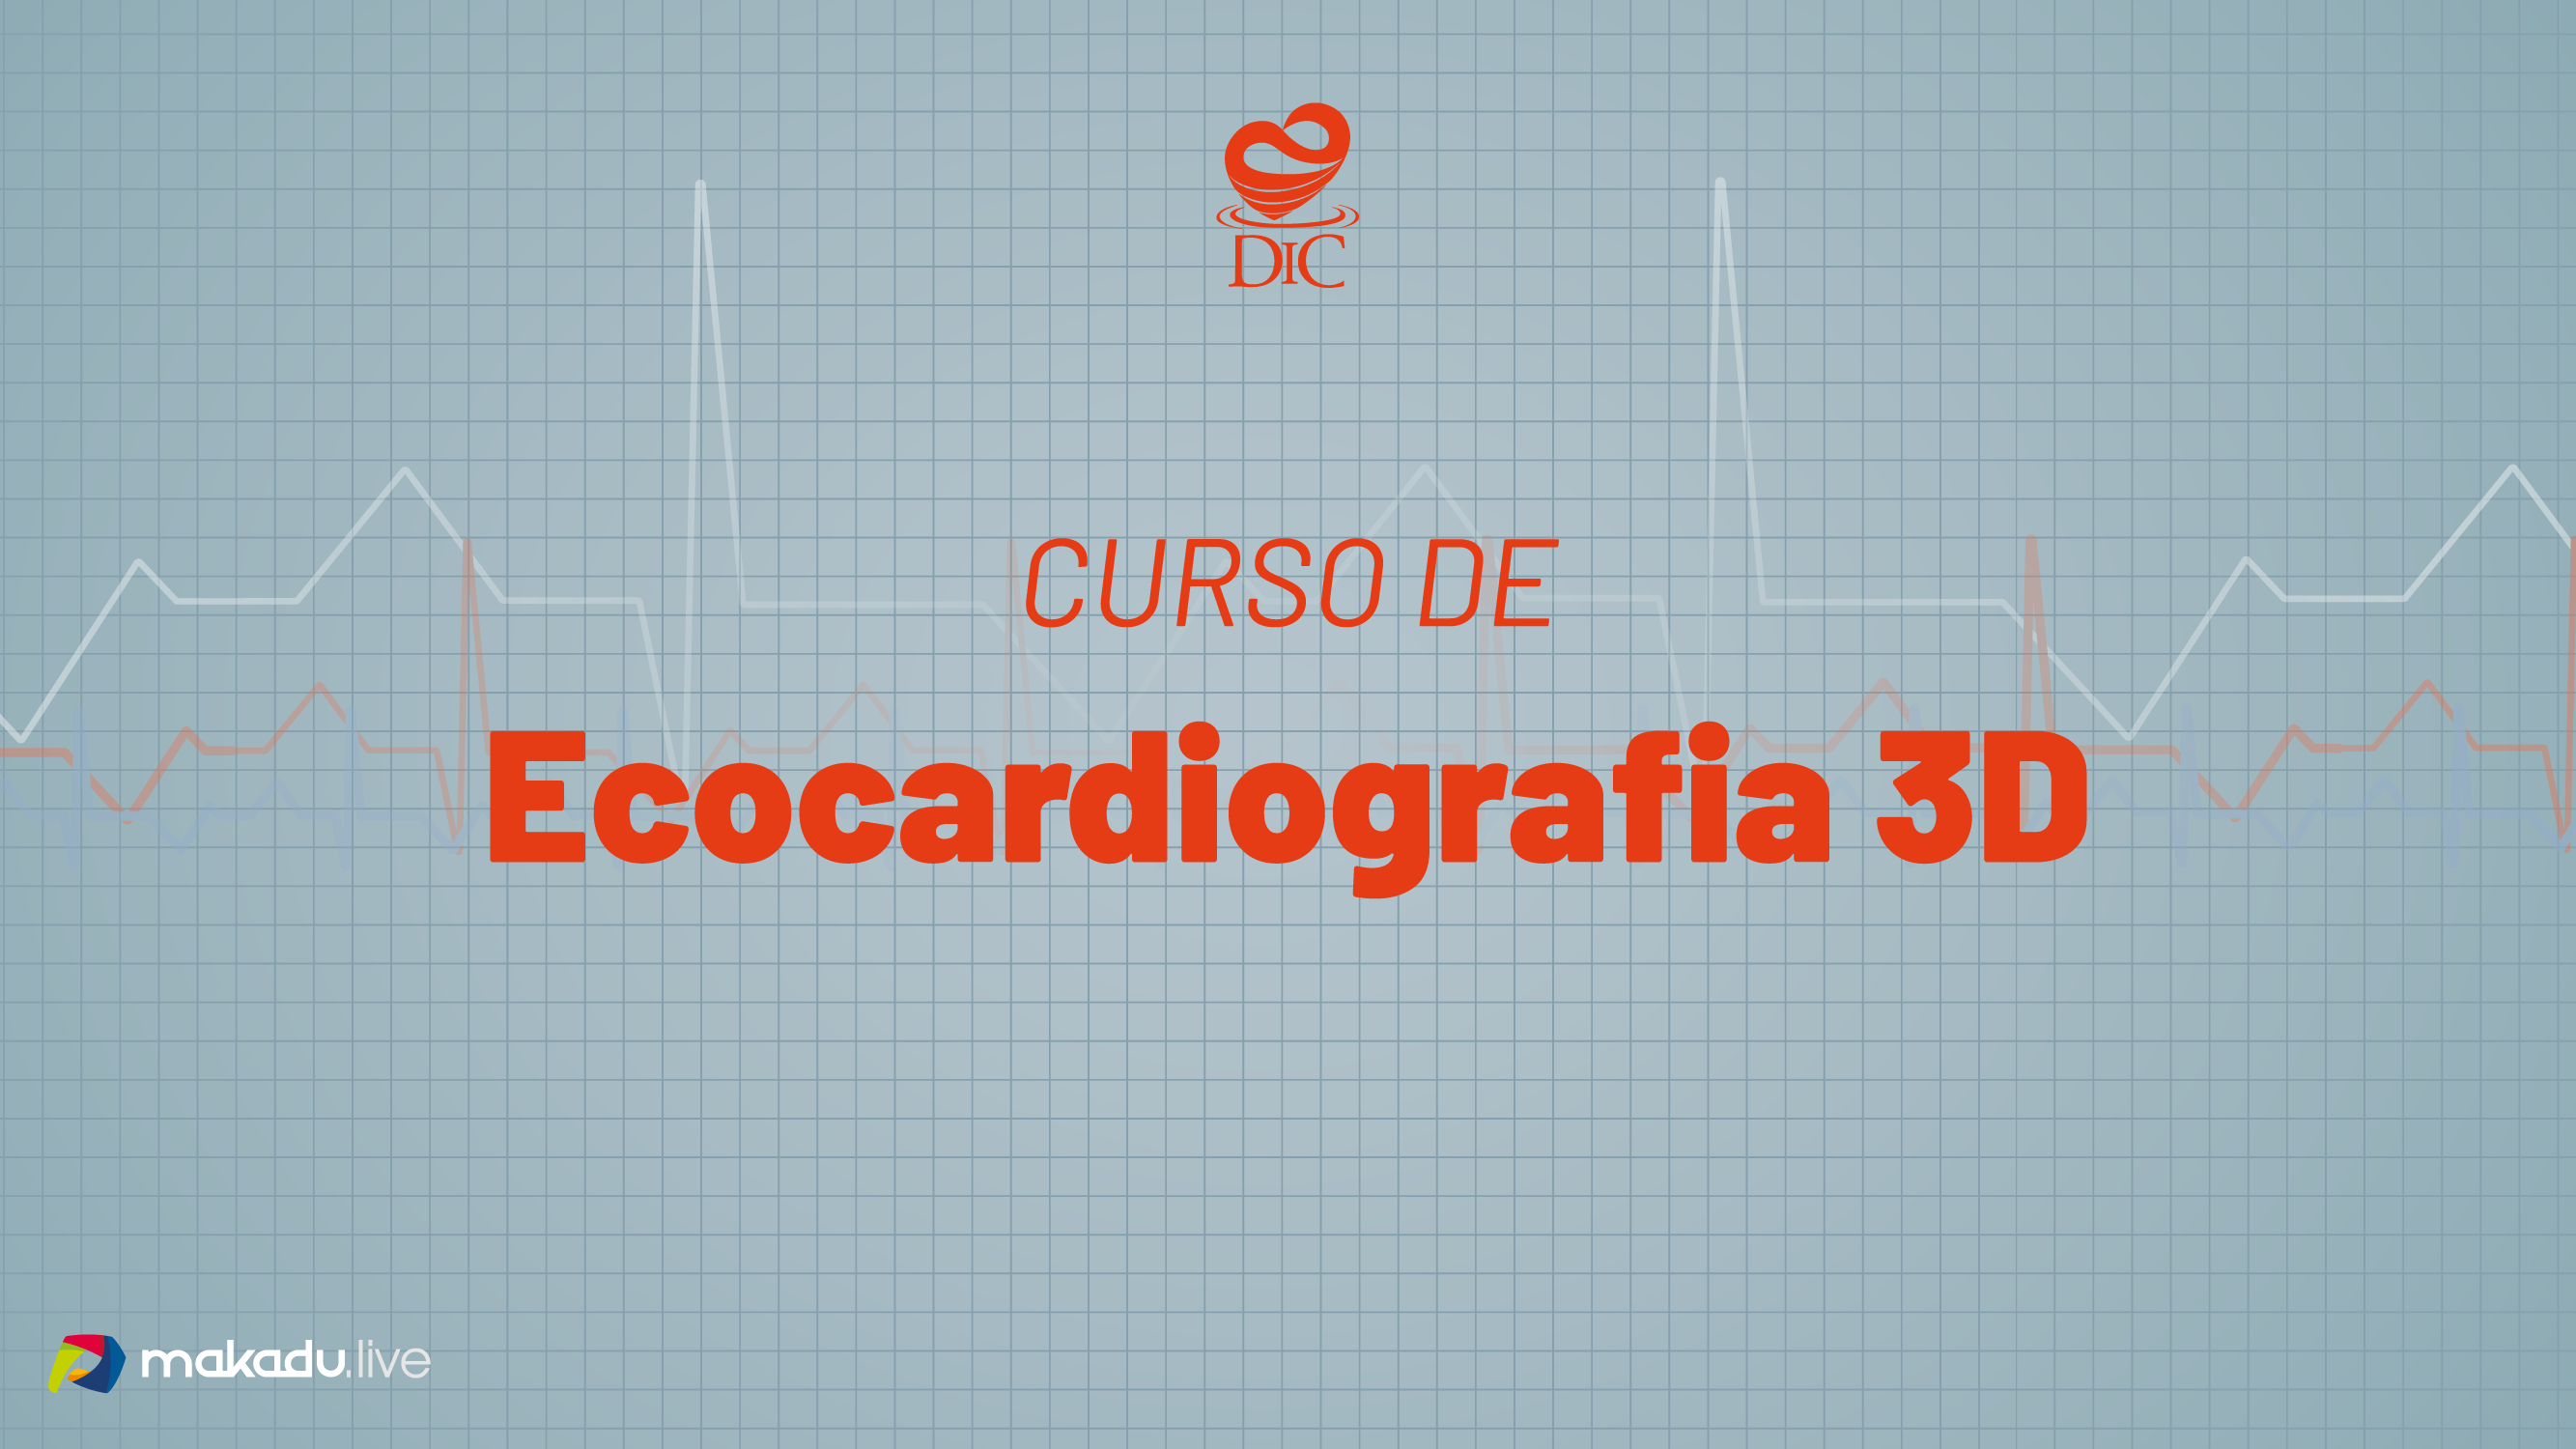 Curso de Ecocardiografia 3D